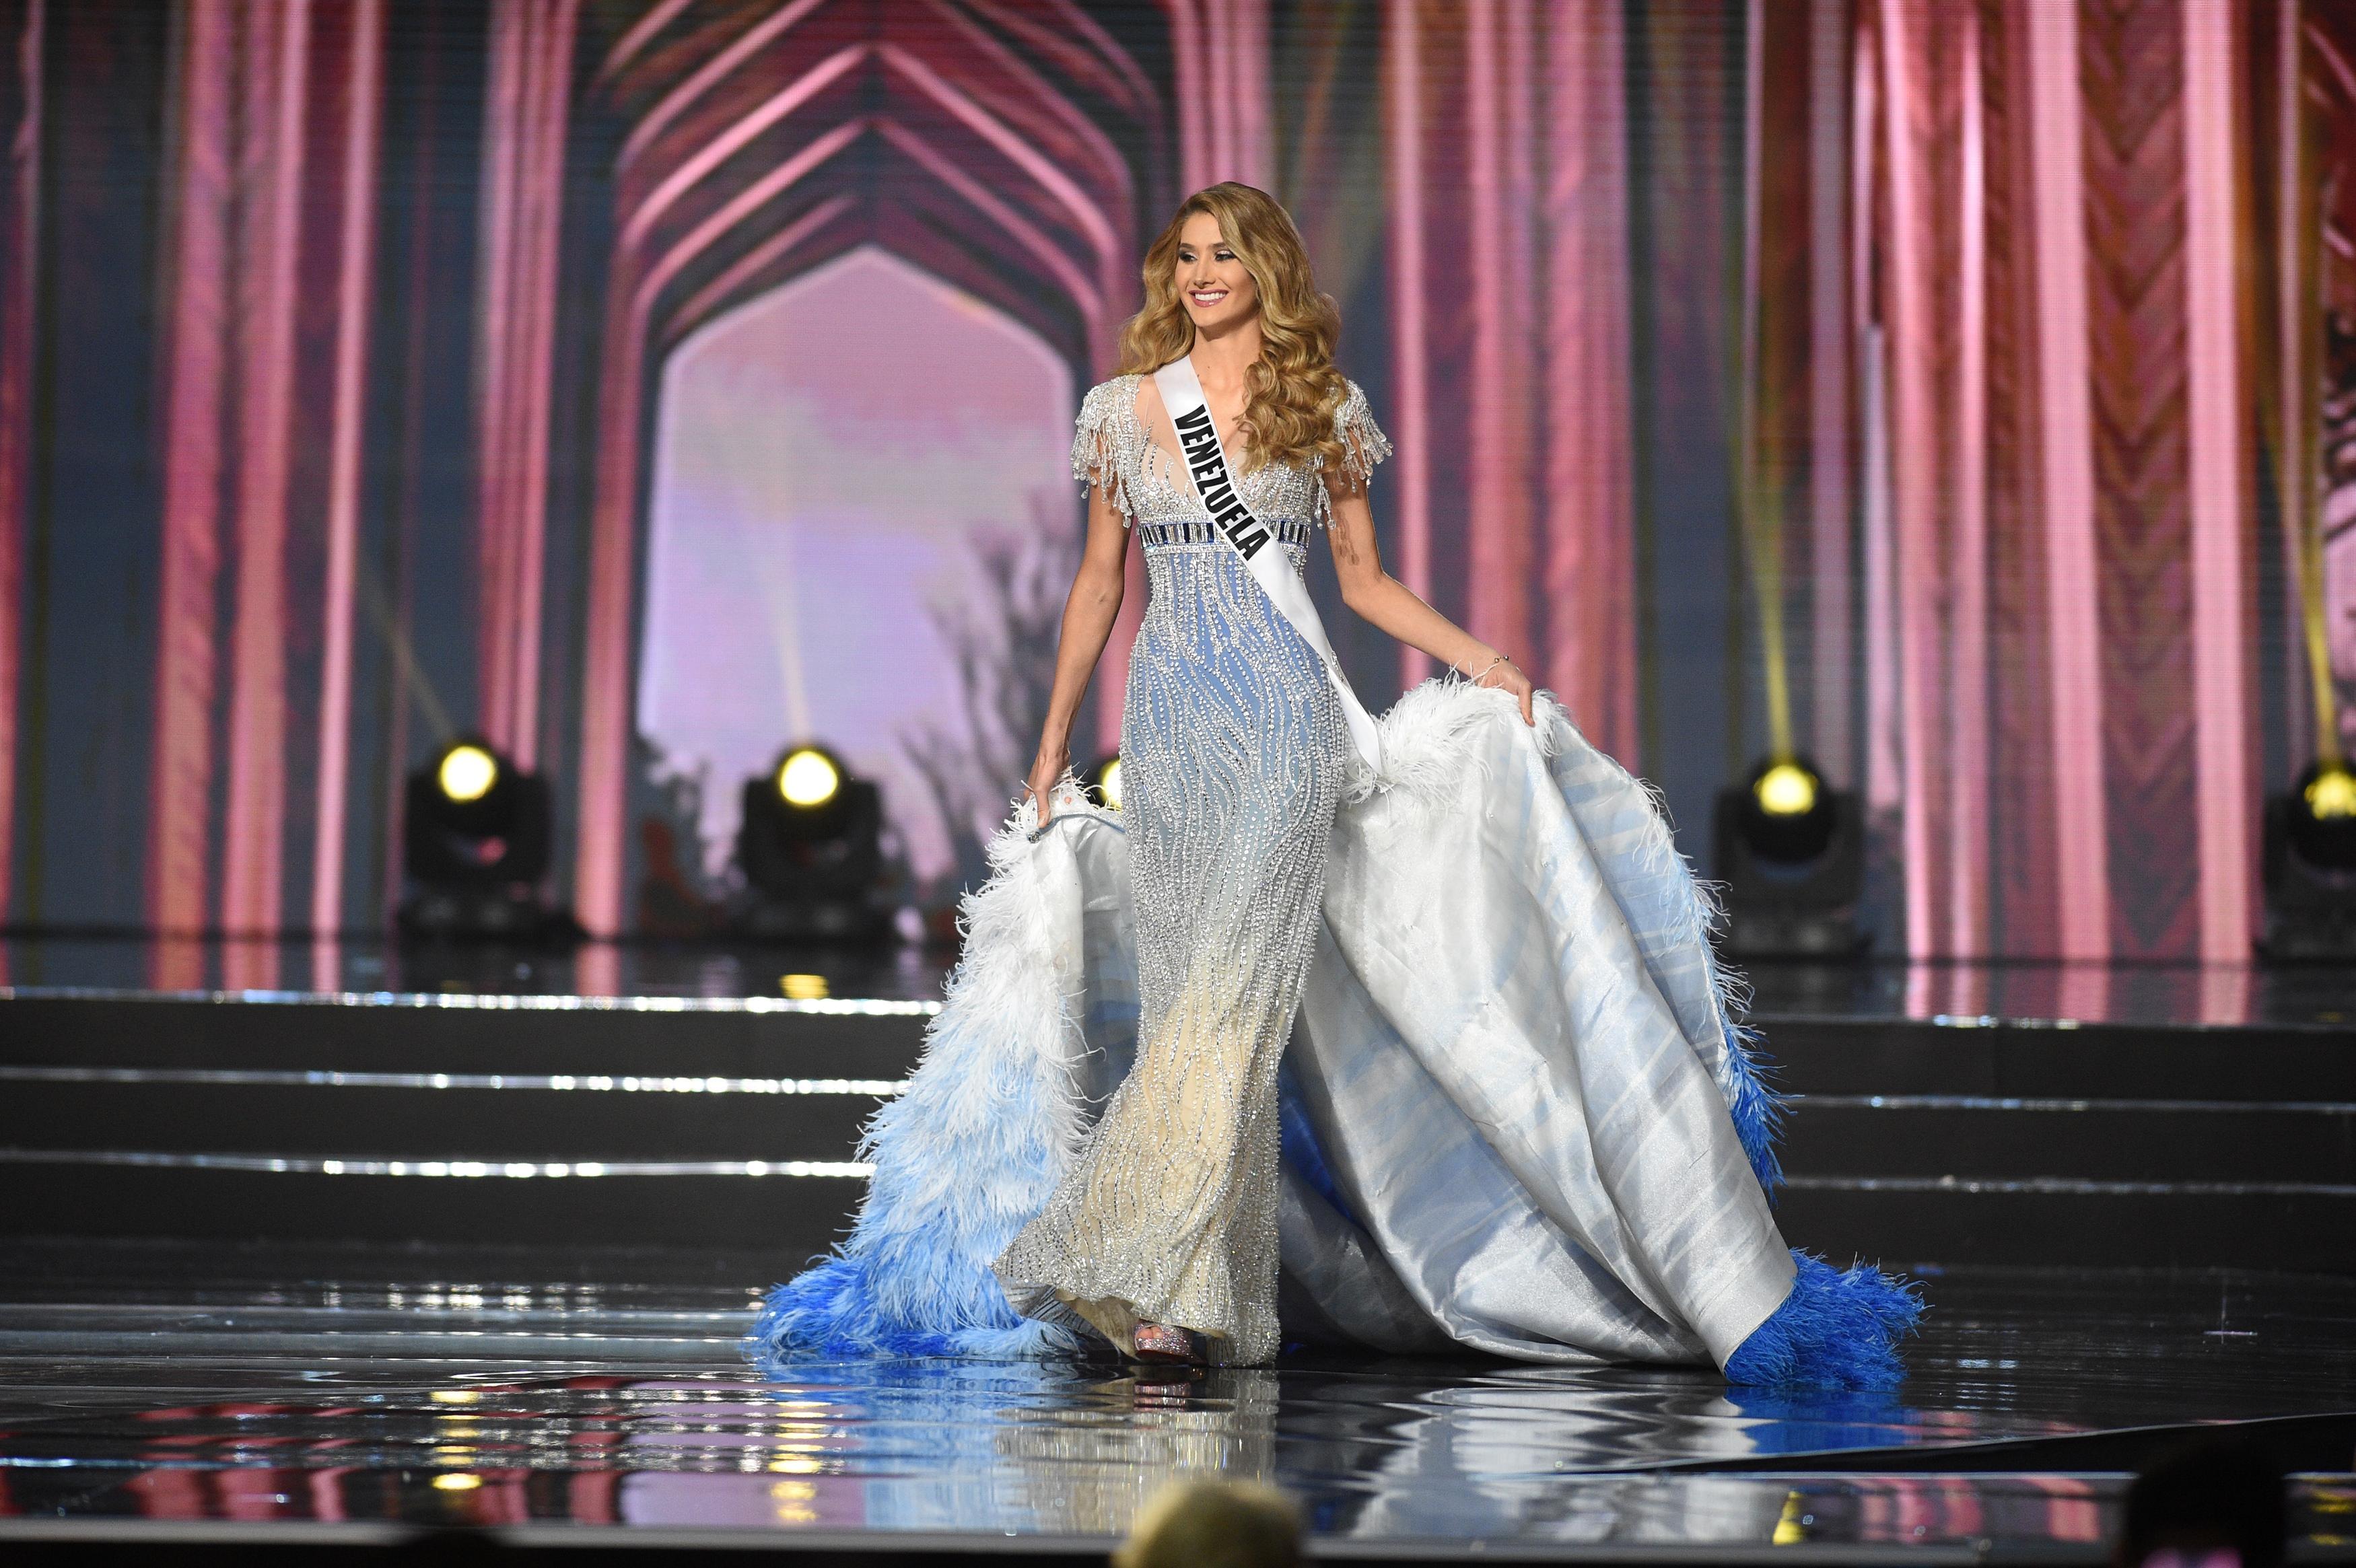 Miss Venezuela, Mariam Habach Santucci